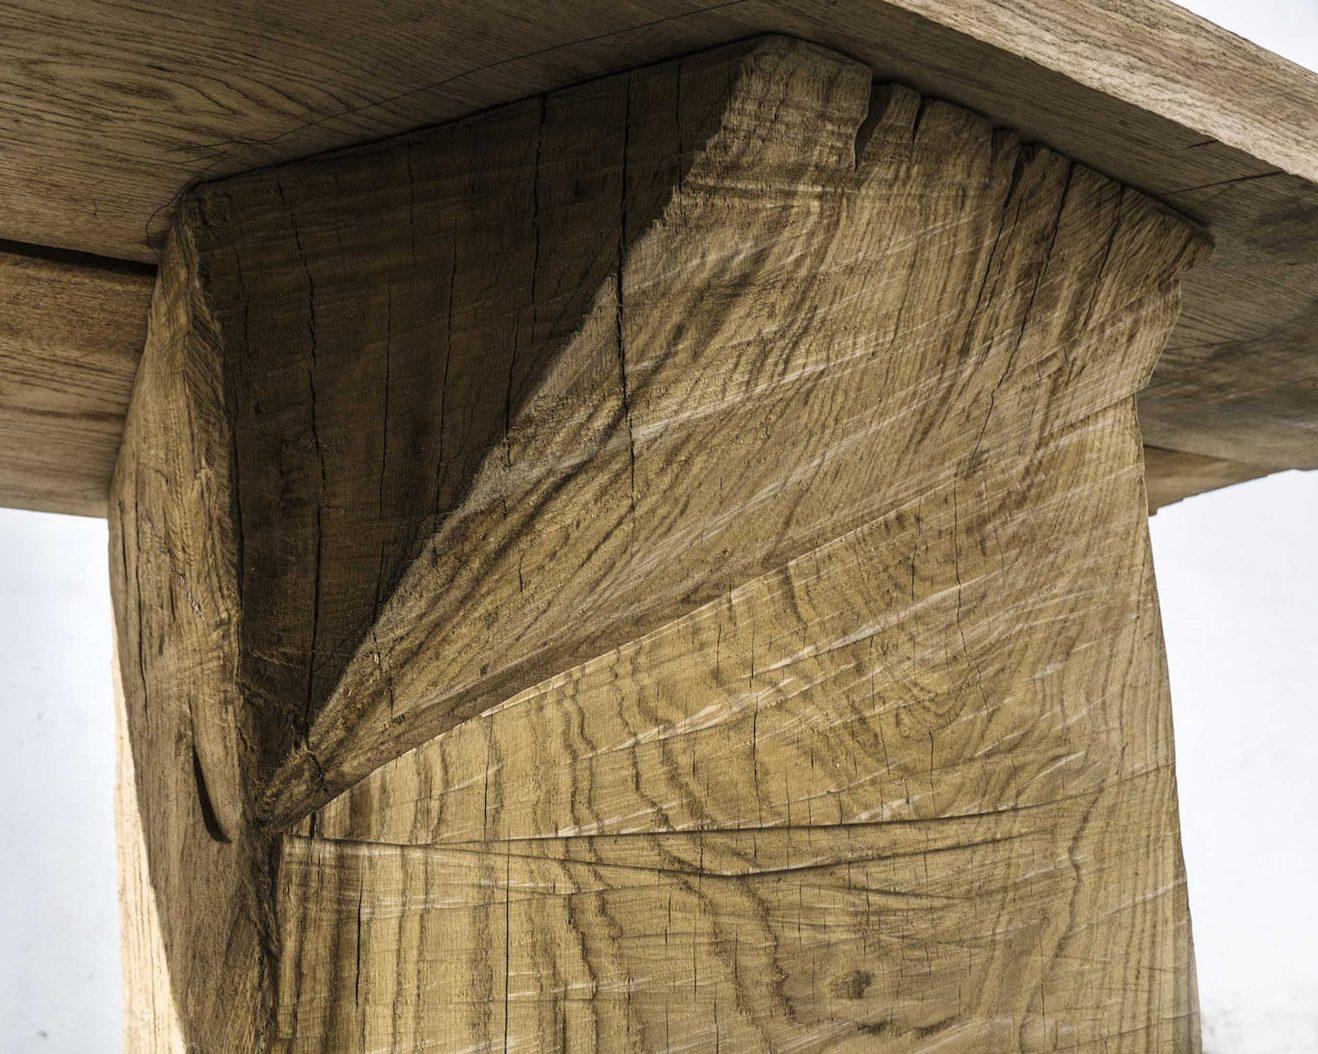 Soha-Massive-Table-Savannah-Bay-Gallery-Design-2